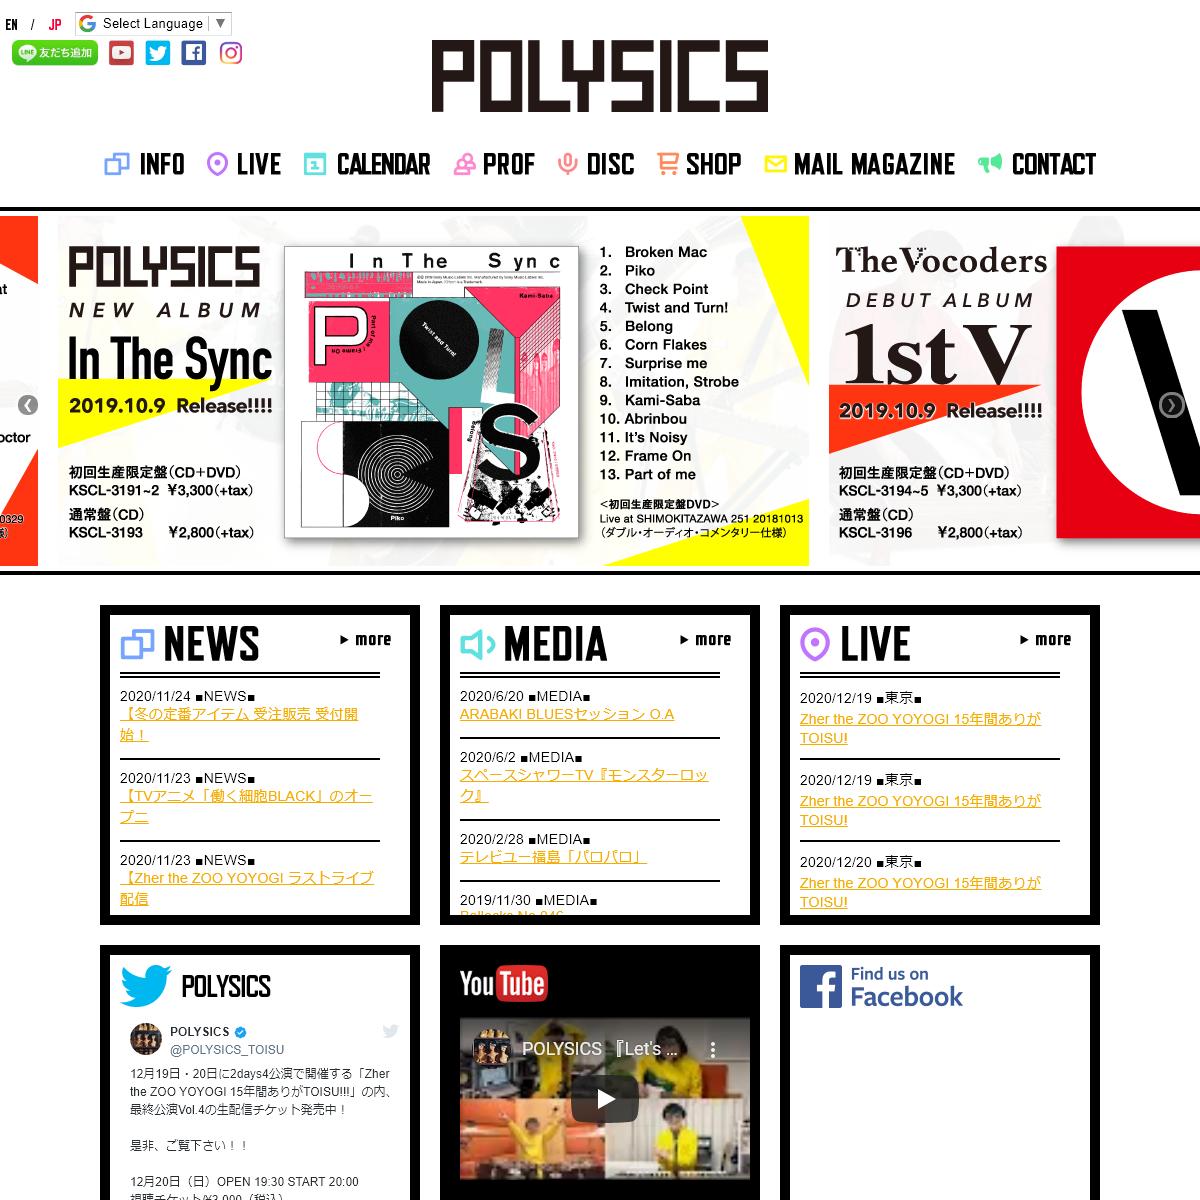 POLYSICS OFFICIAL WEBSITE -- ポリシックス オフィシャル ウェブサイト